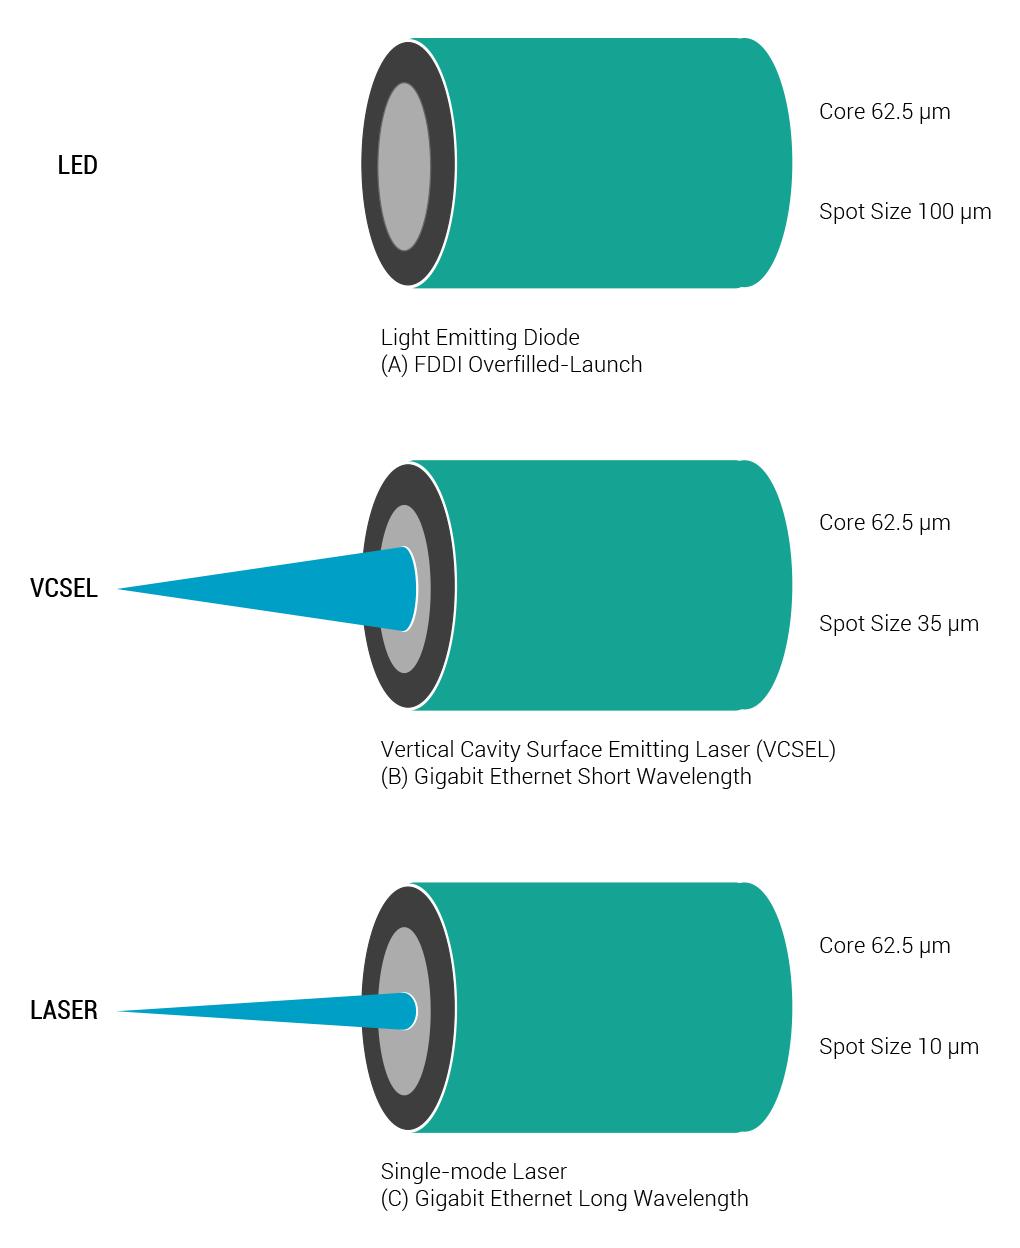 Fiber Laser Light Power Source Vs Led Lightemitting Diodes Ledandlightcircuit Circuit Diagram Design Contrasts Optic